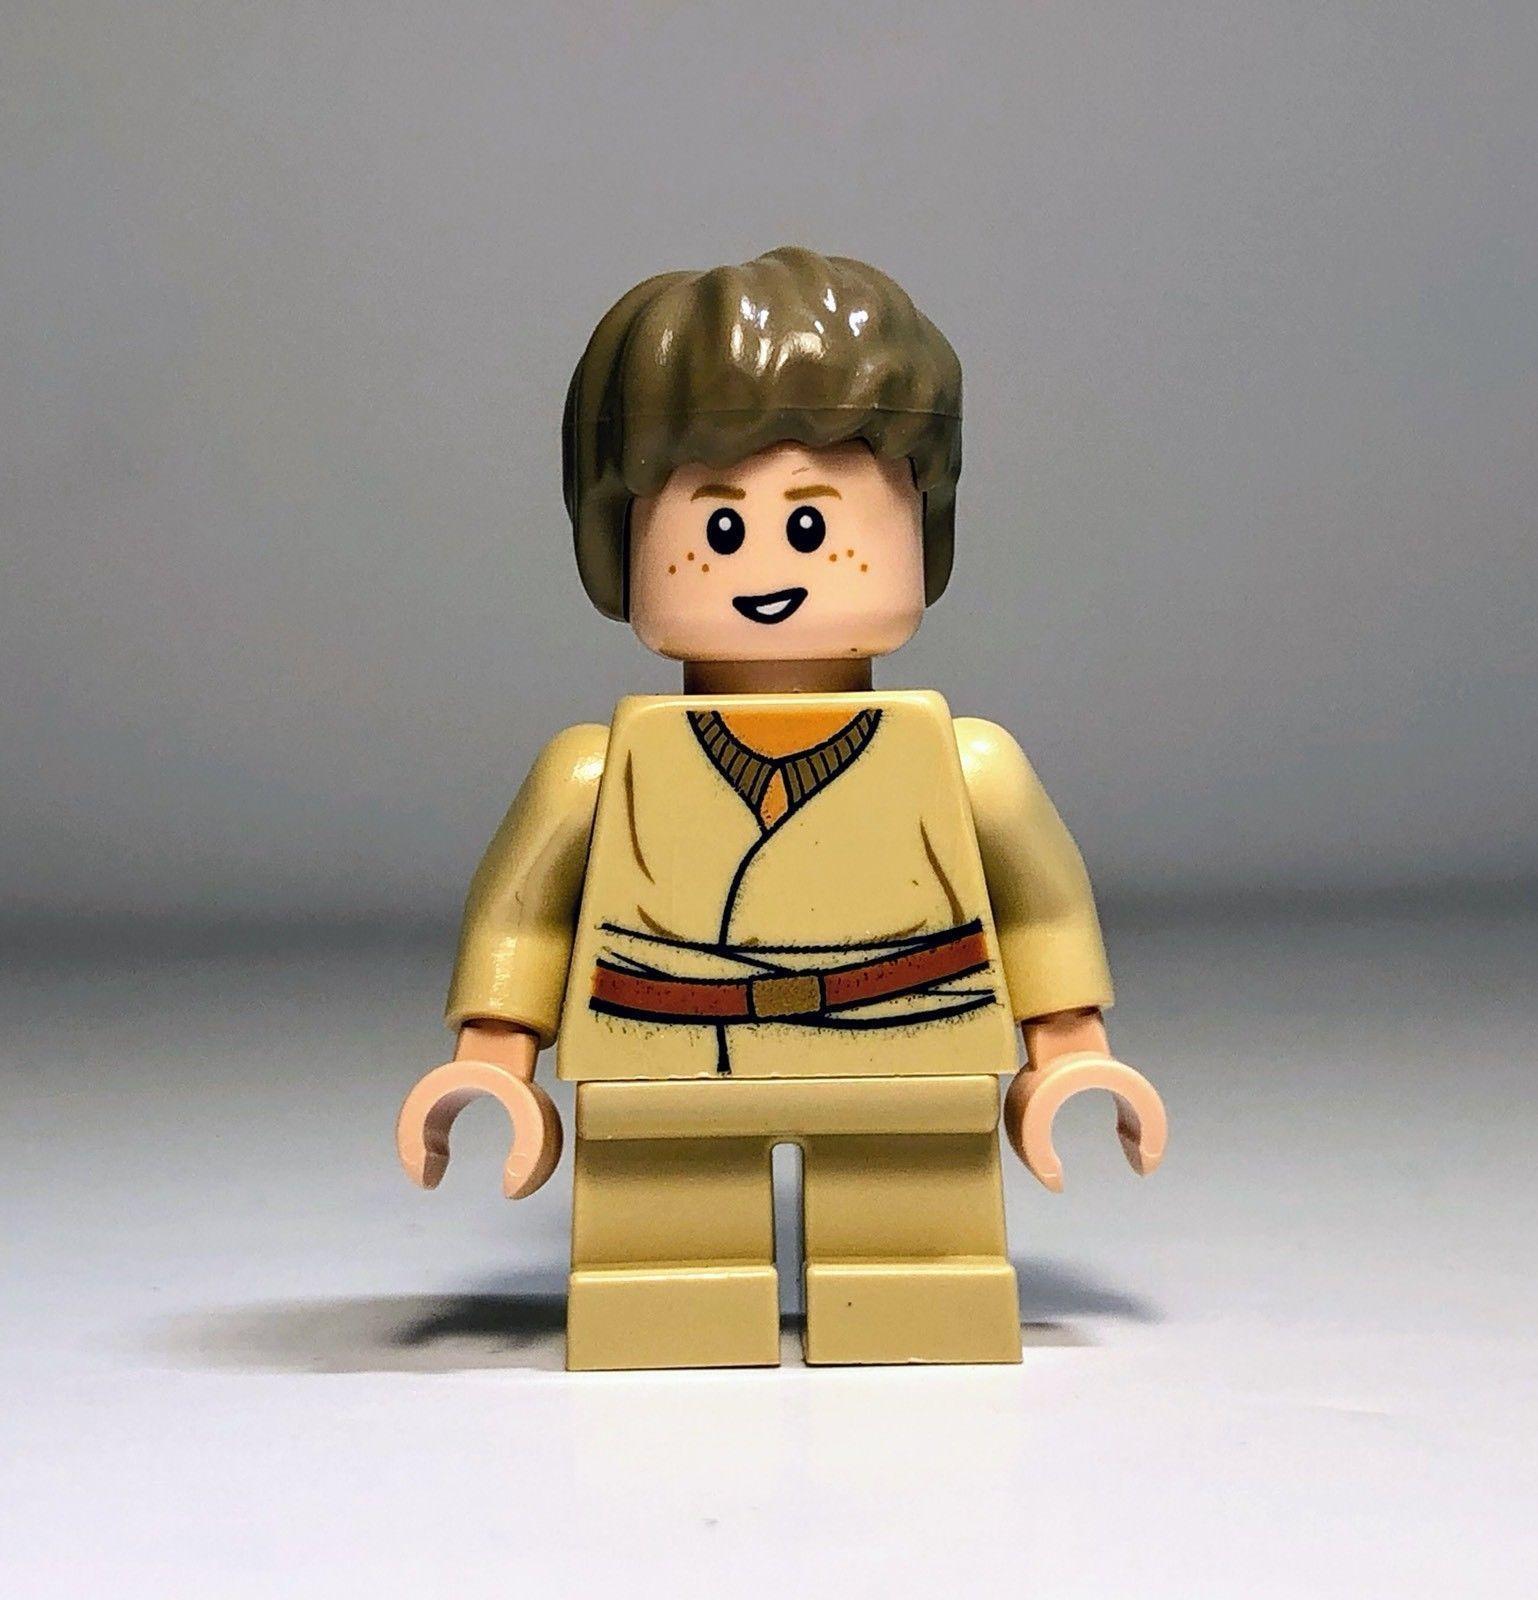 STAR WARS Galactic Heroes young ANAKIN naboo pilot